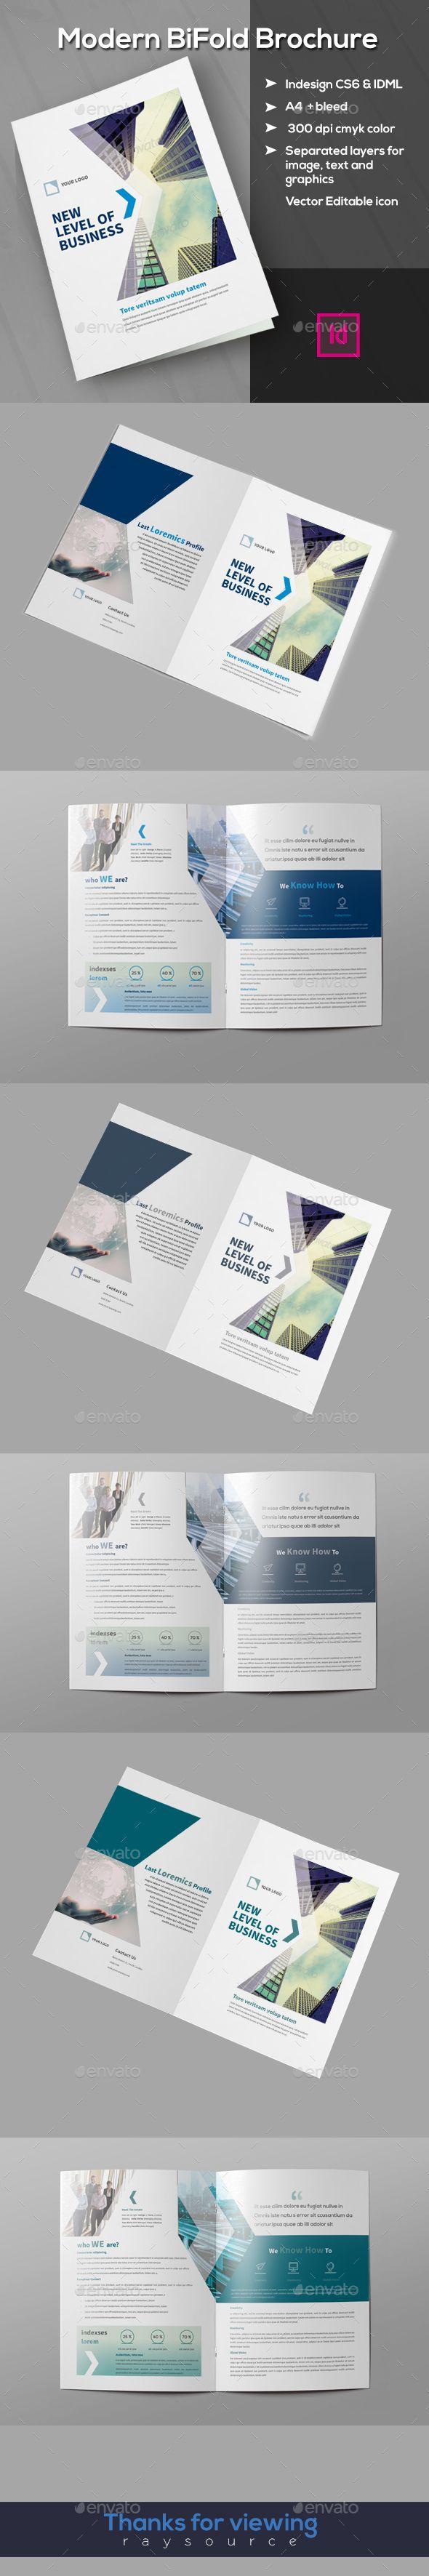 Modern Bifold Brochure Template InDesign INDD. Download here: https ...